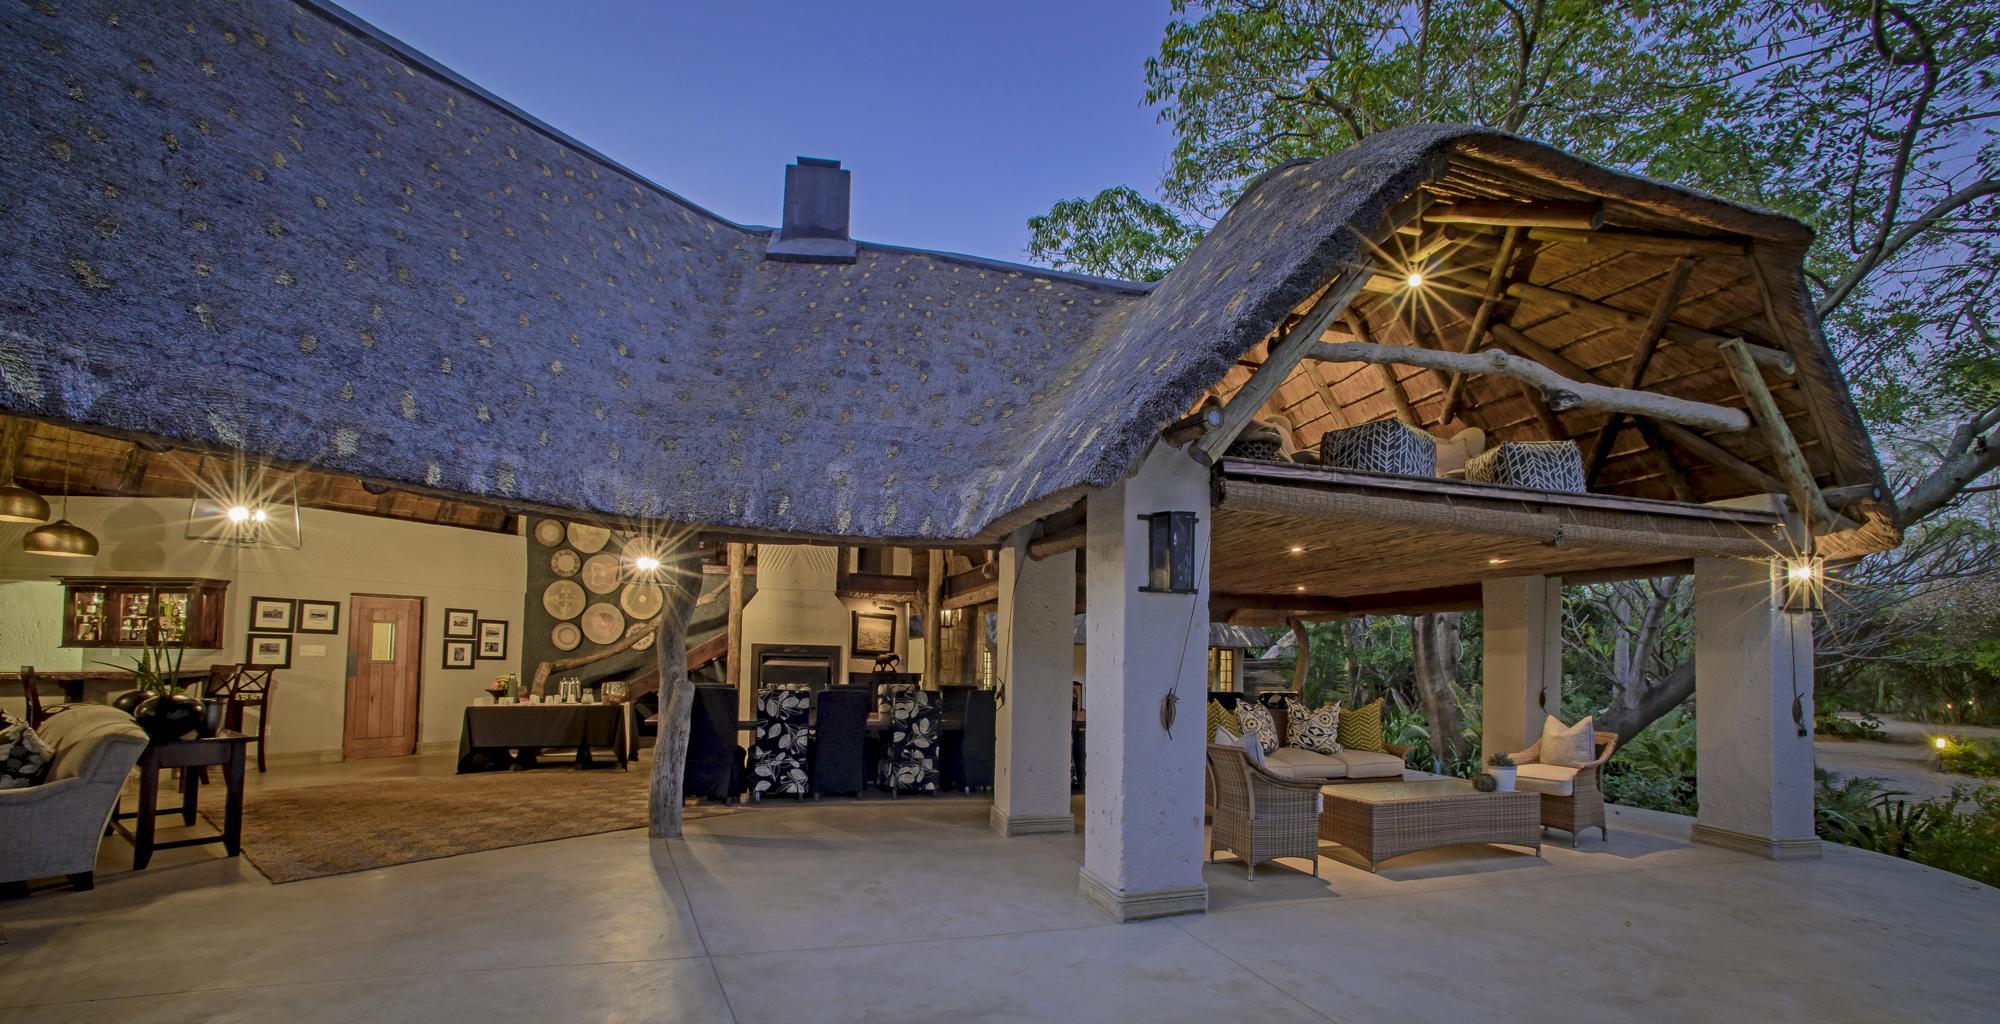 South-Africa-Savanna-Private-Exterior